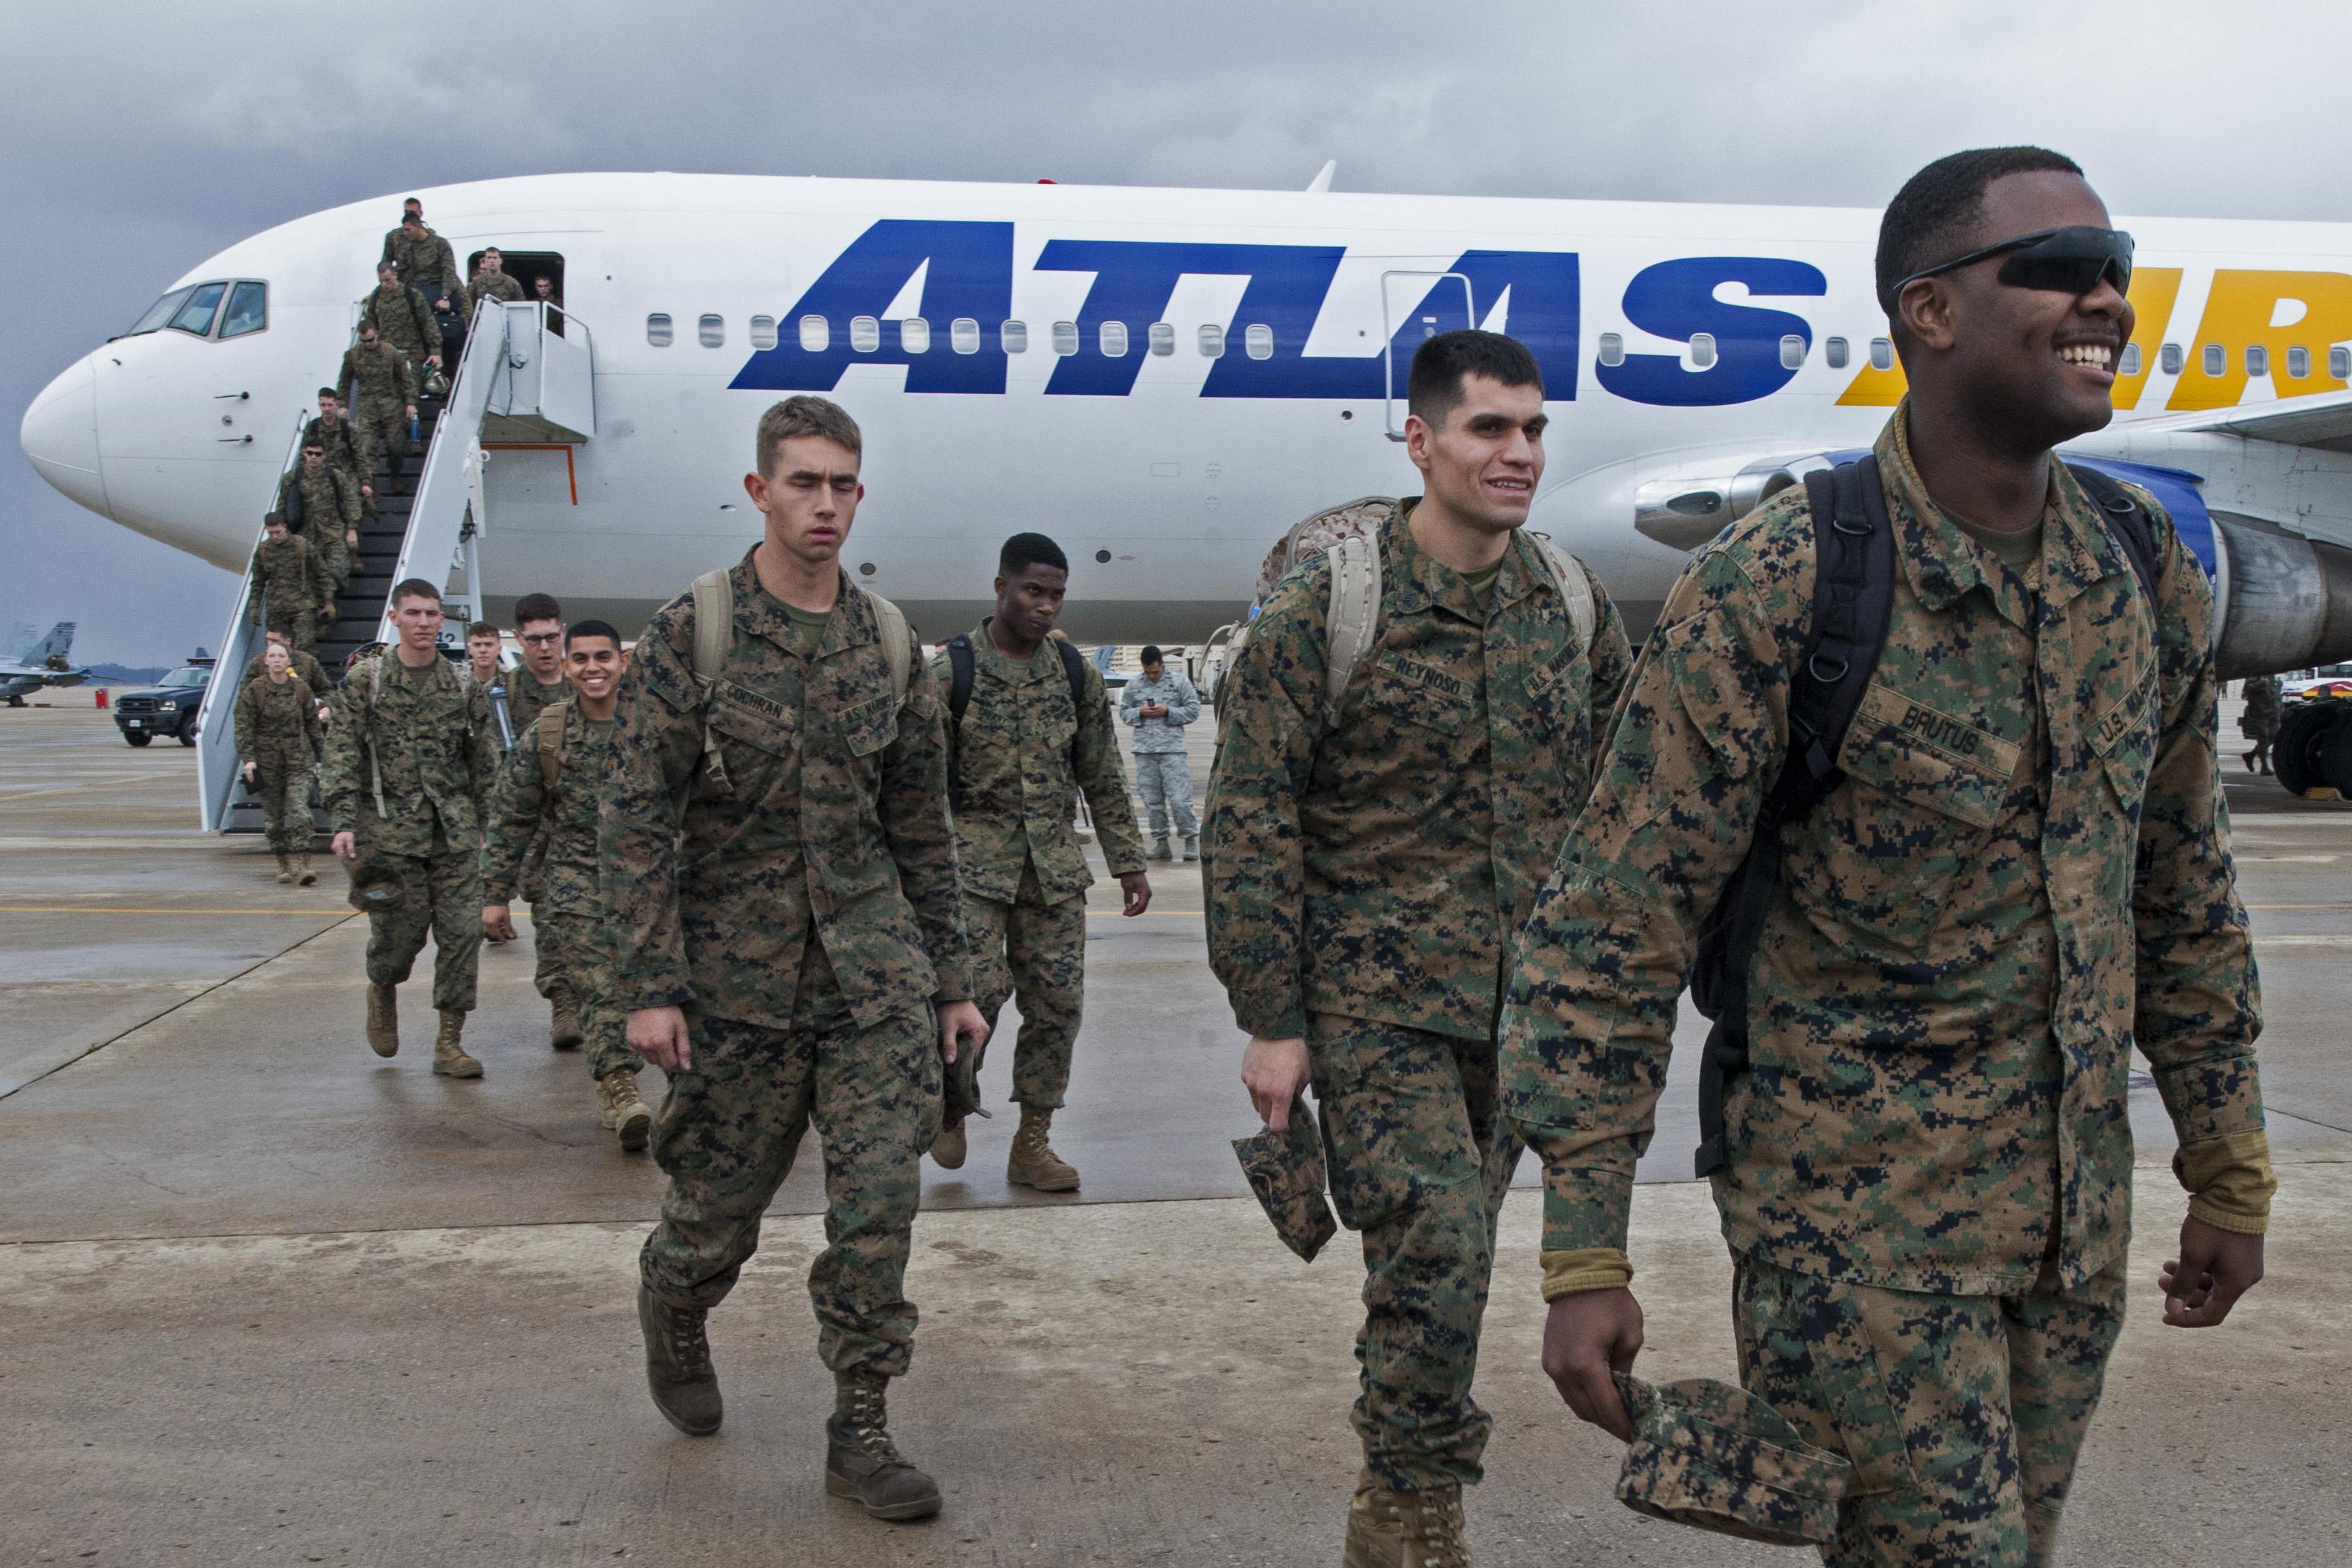 us army navy marines air force